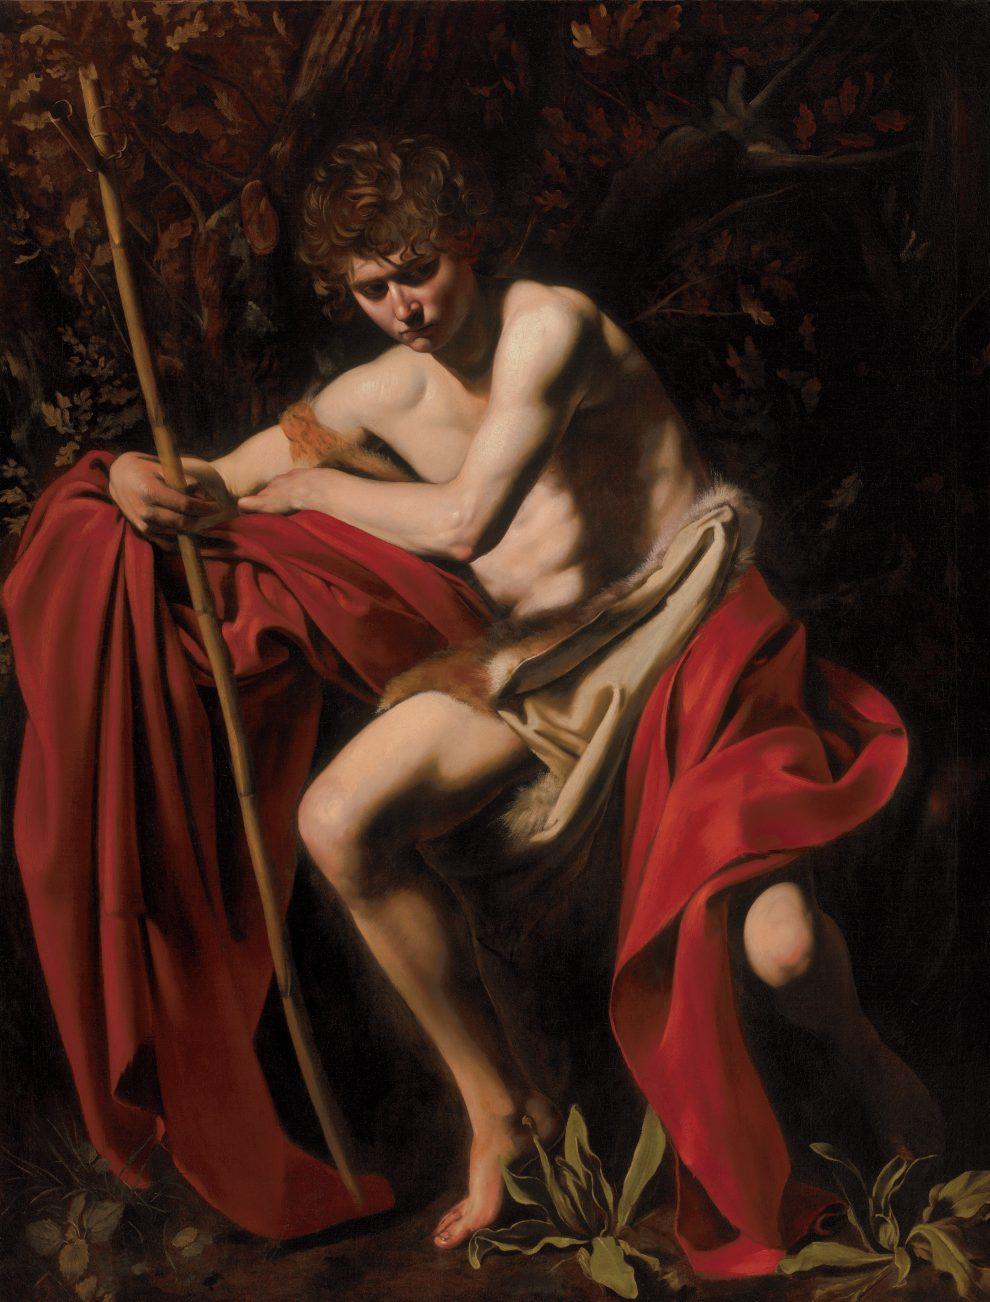 San Giovanni Battista, 1604 circa. Olio su tela, 172,72 x 132,08 cm. The Nelson-Atkins Museum of Art, Kansas City, Missouri Photo: Jamison Miller, © The Nelson-AtkinsMuseum of Art